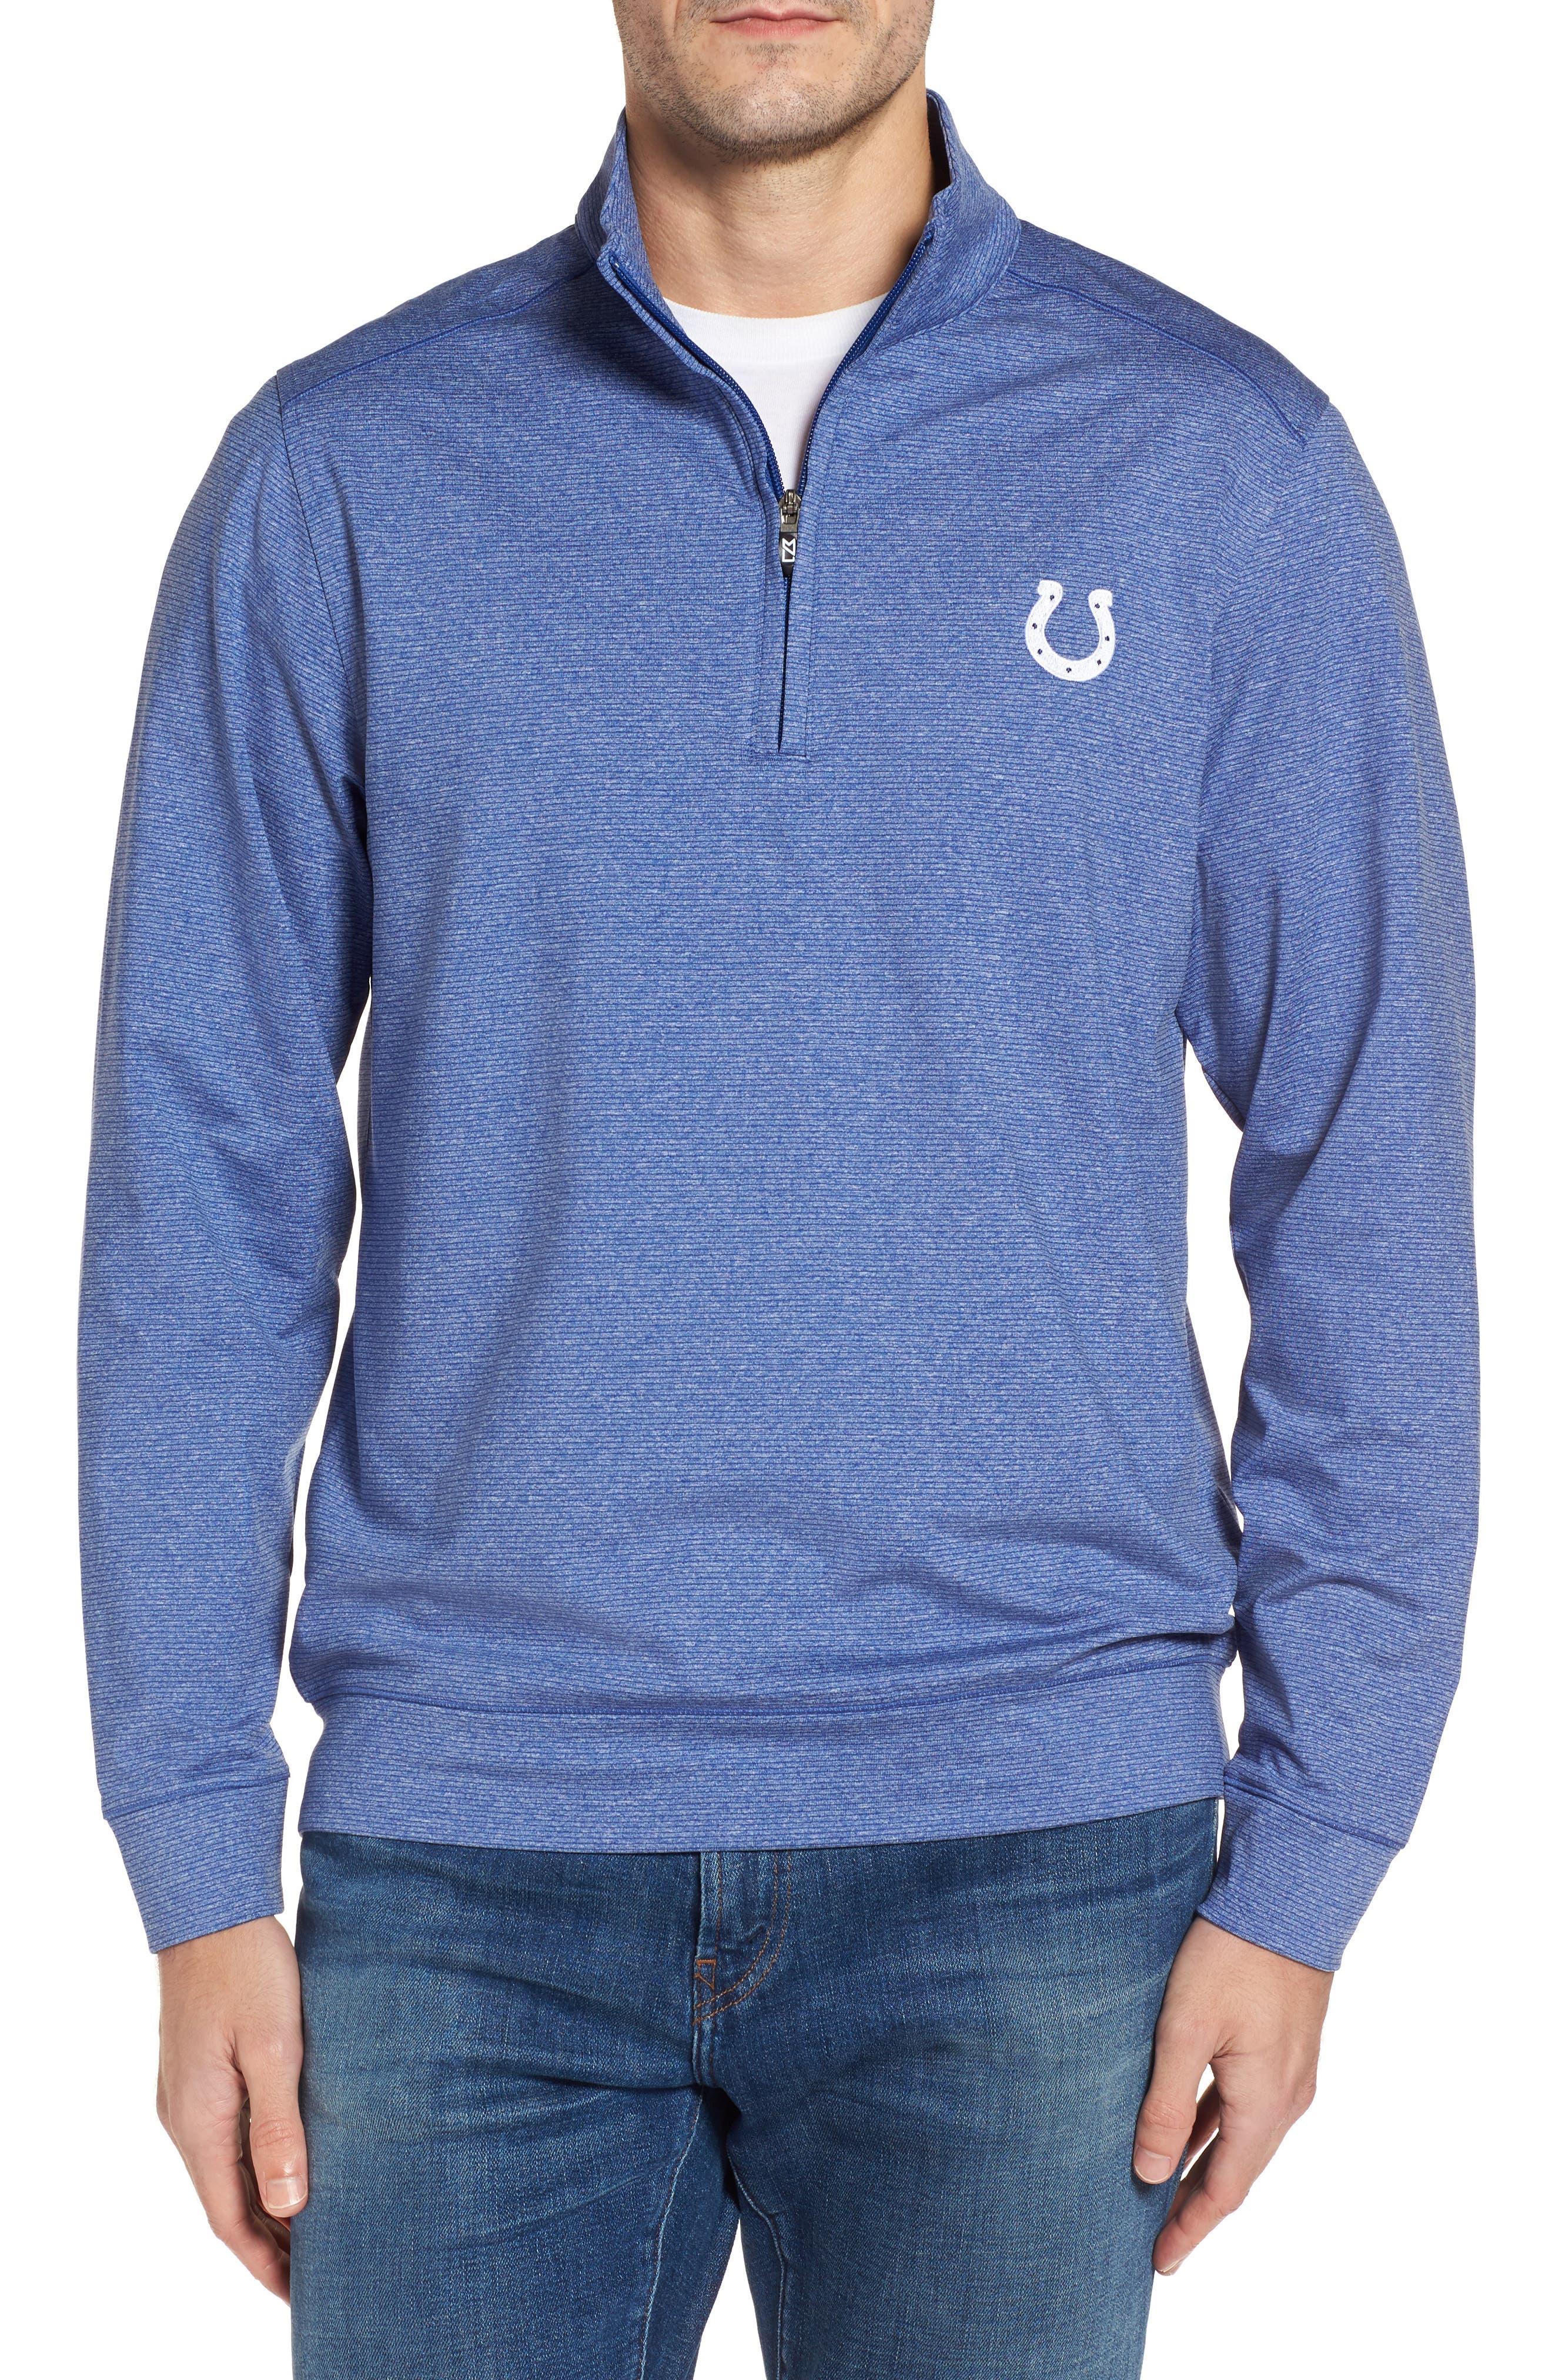 Shoreline - Indianapolis Colts Half Zip Pullover,                         Main,                         color, Tour Blue Heather